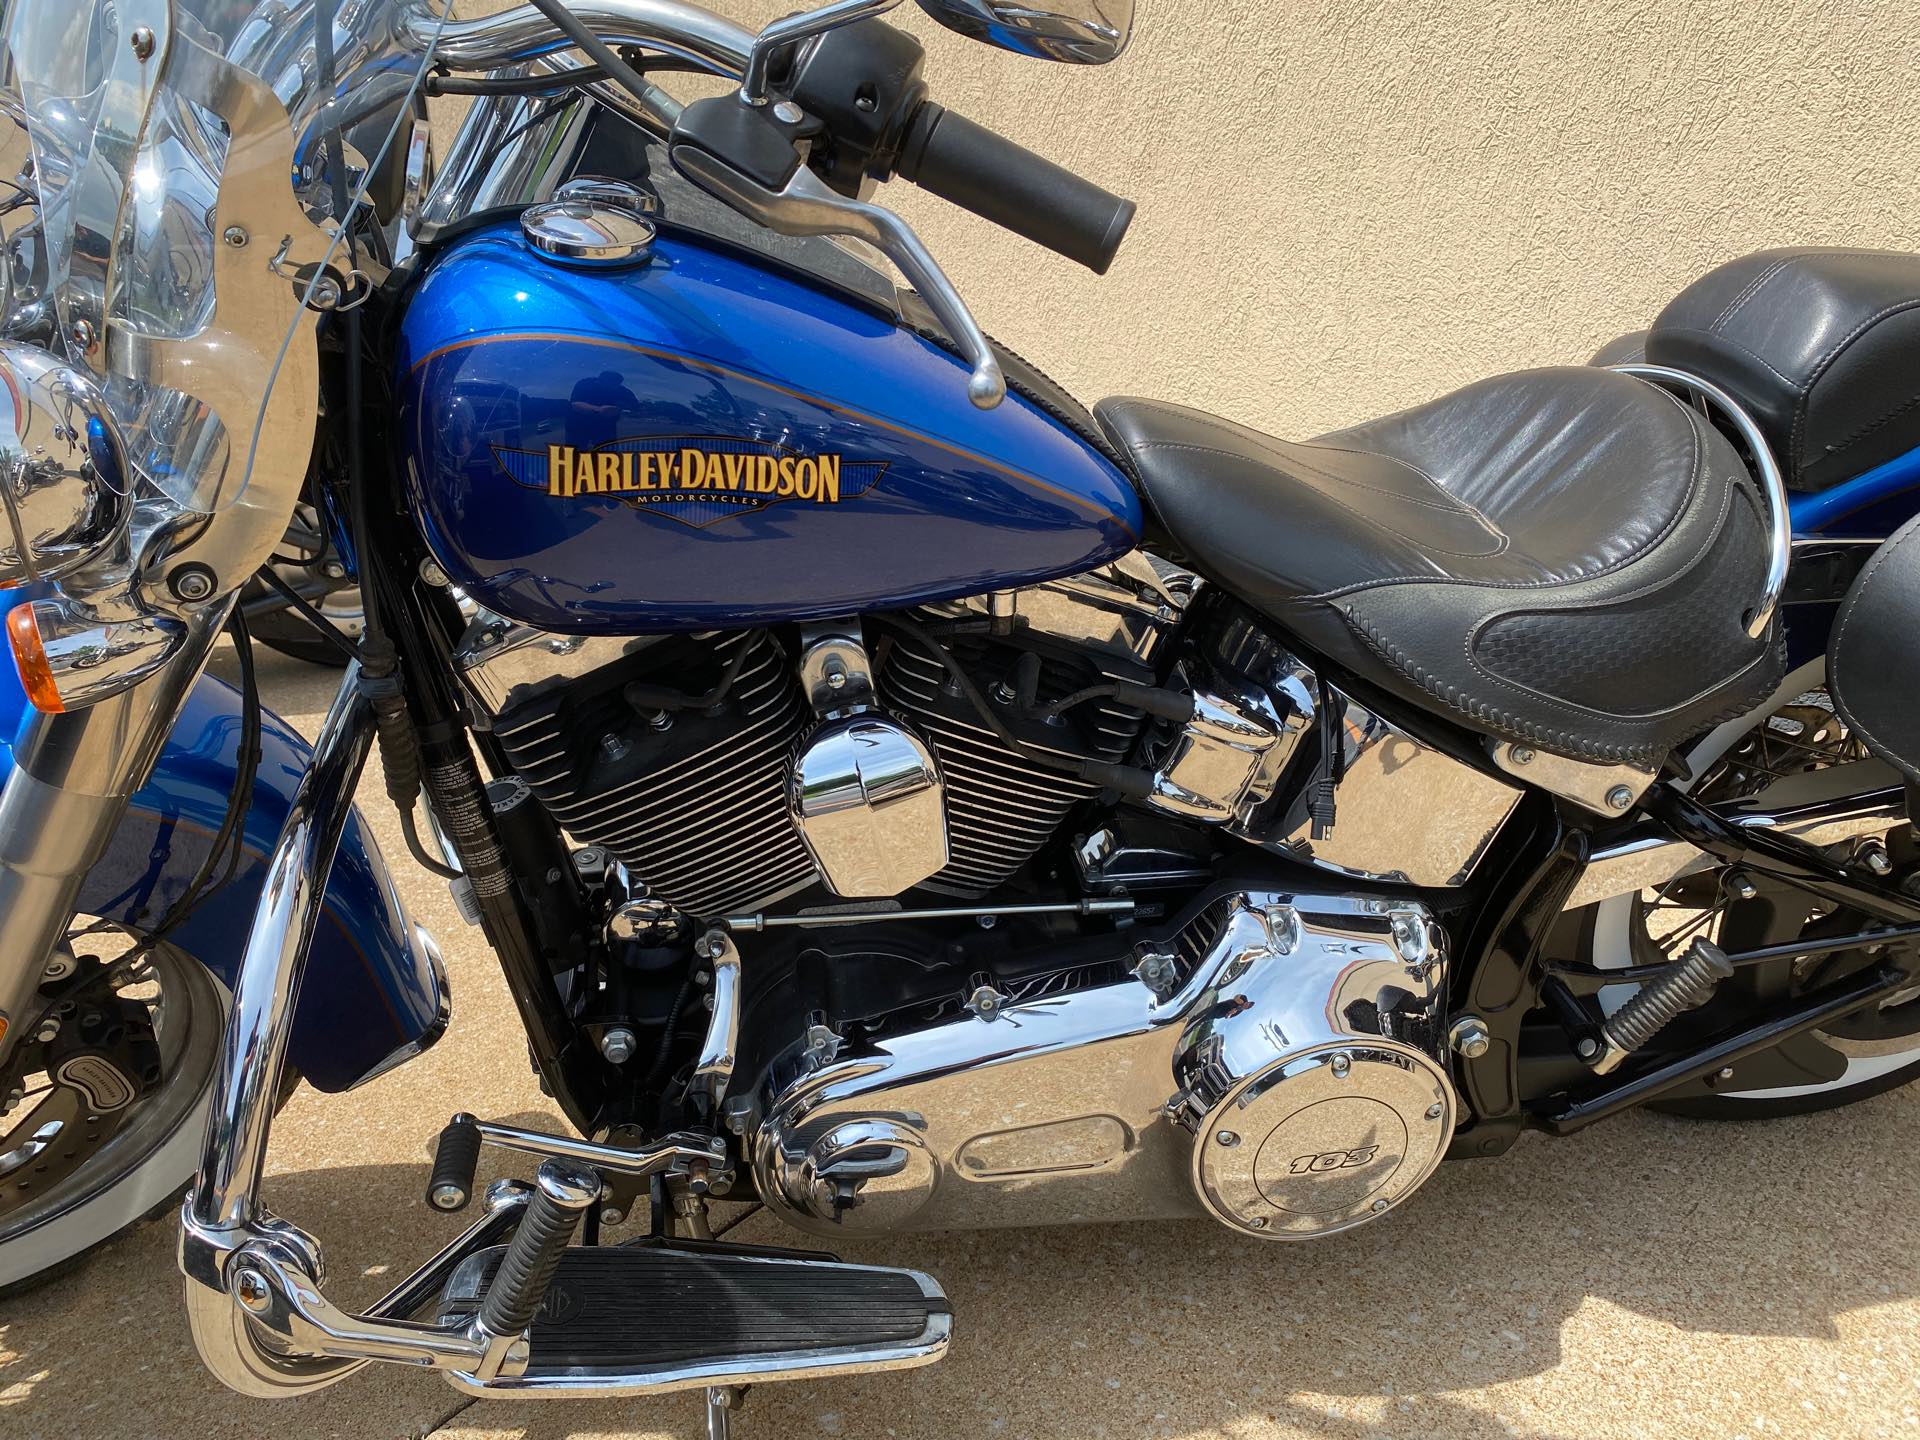 2017 Harley-Davidson Softail Deluxe at Gold Star Harley-Davidson